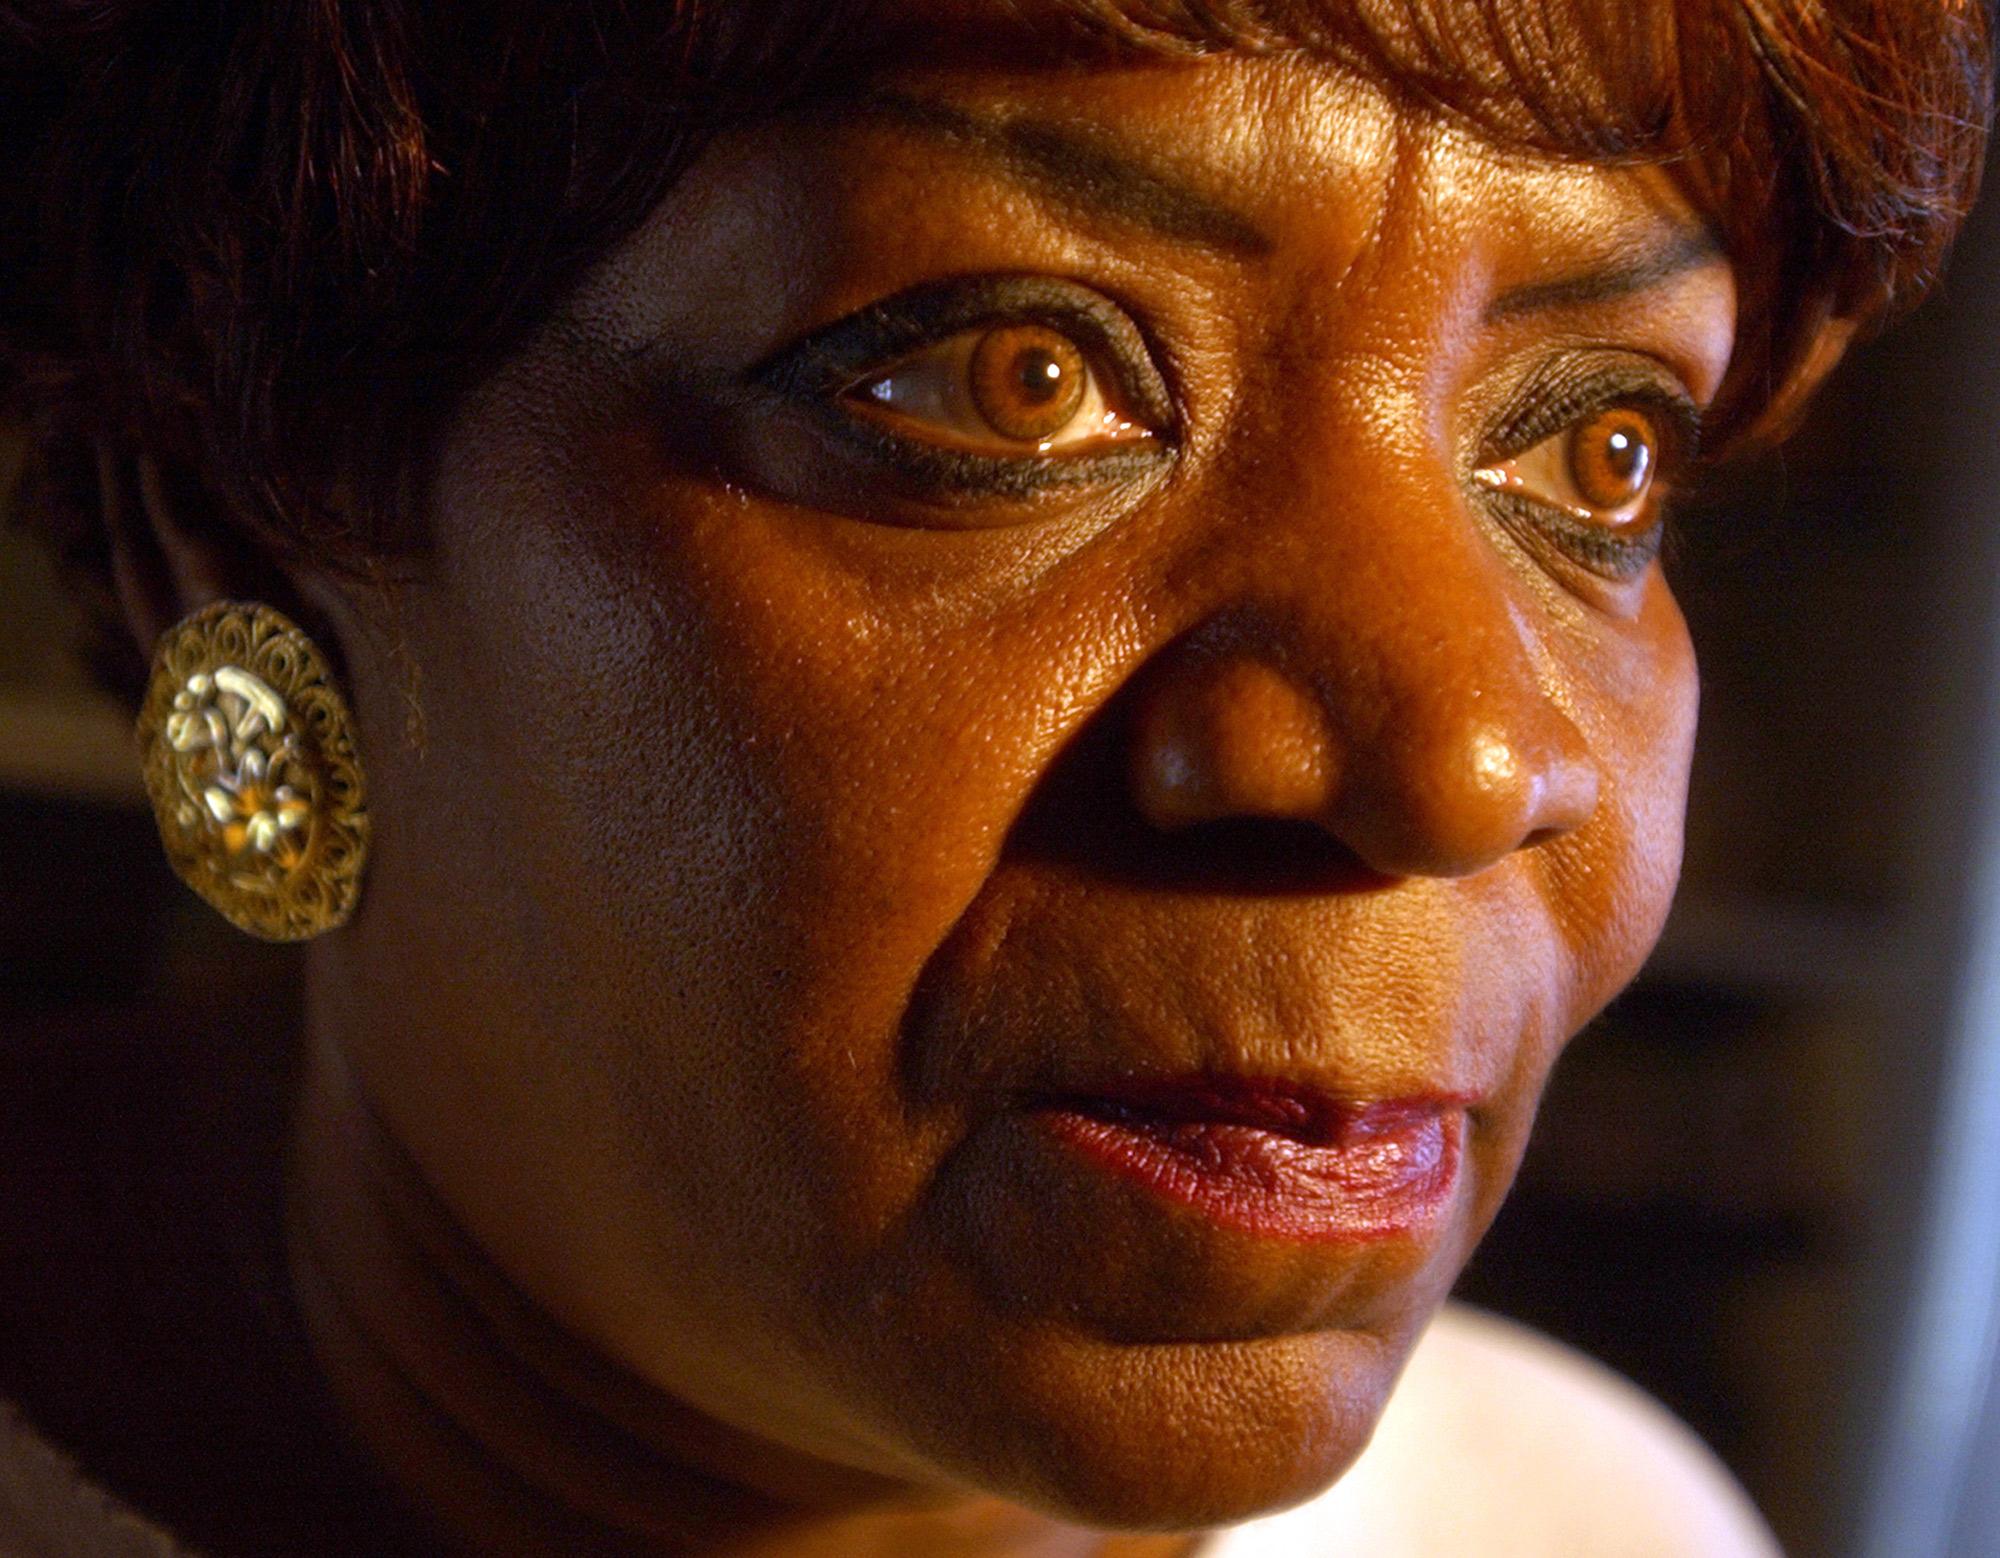 Barbara Johnston recalls the gunshots that killed her daughter Verna.